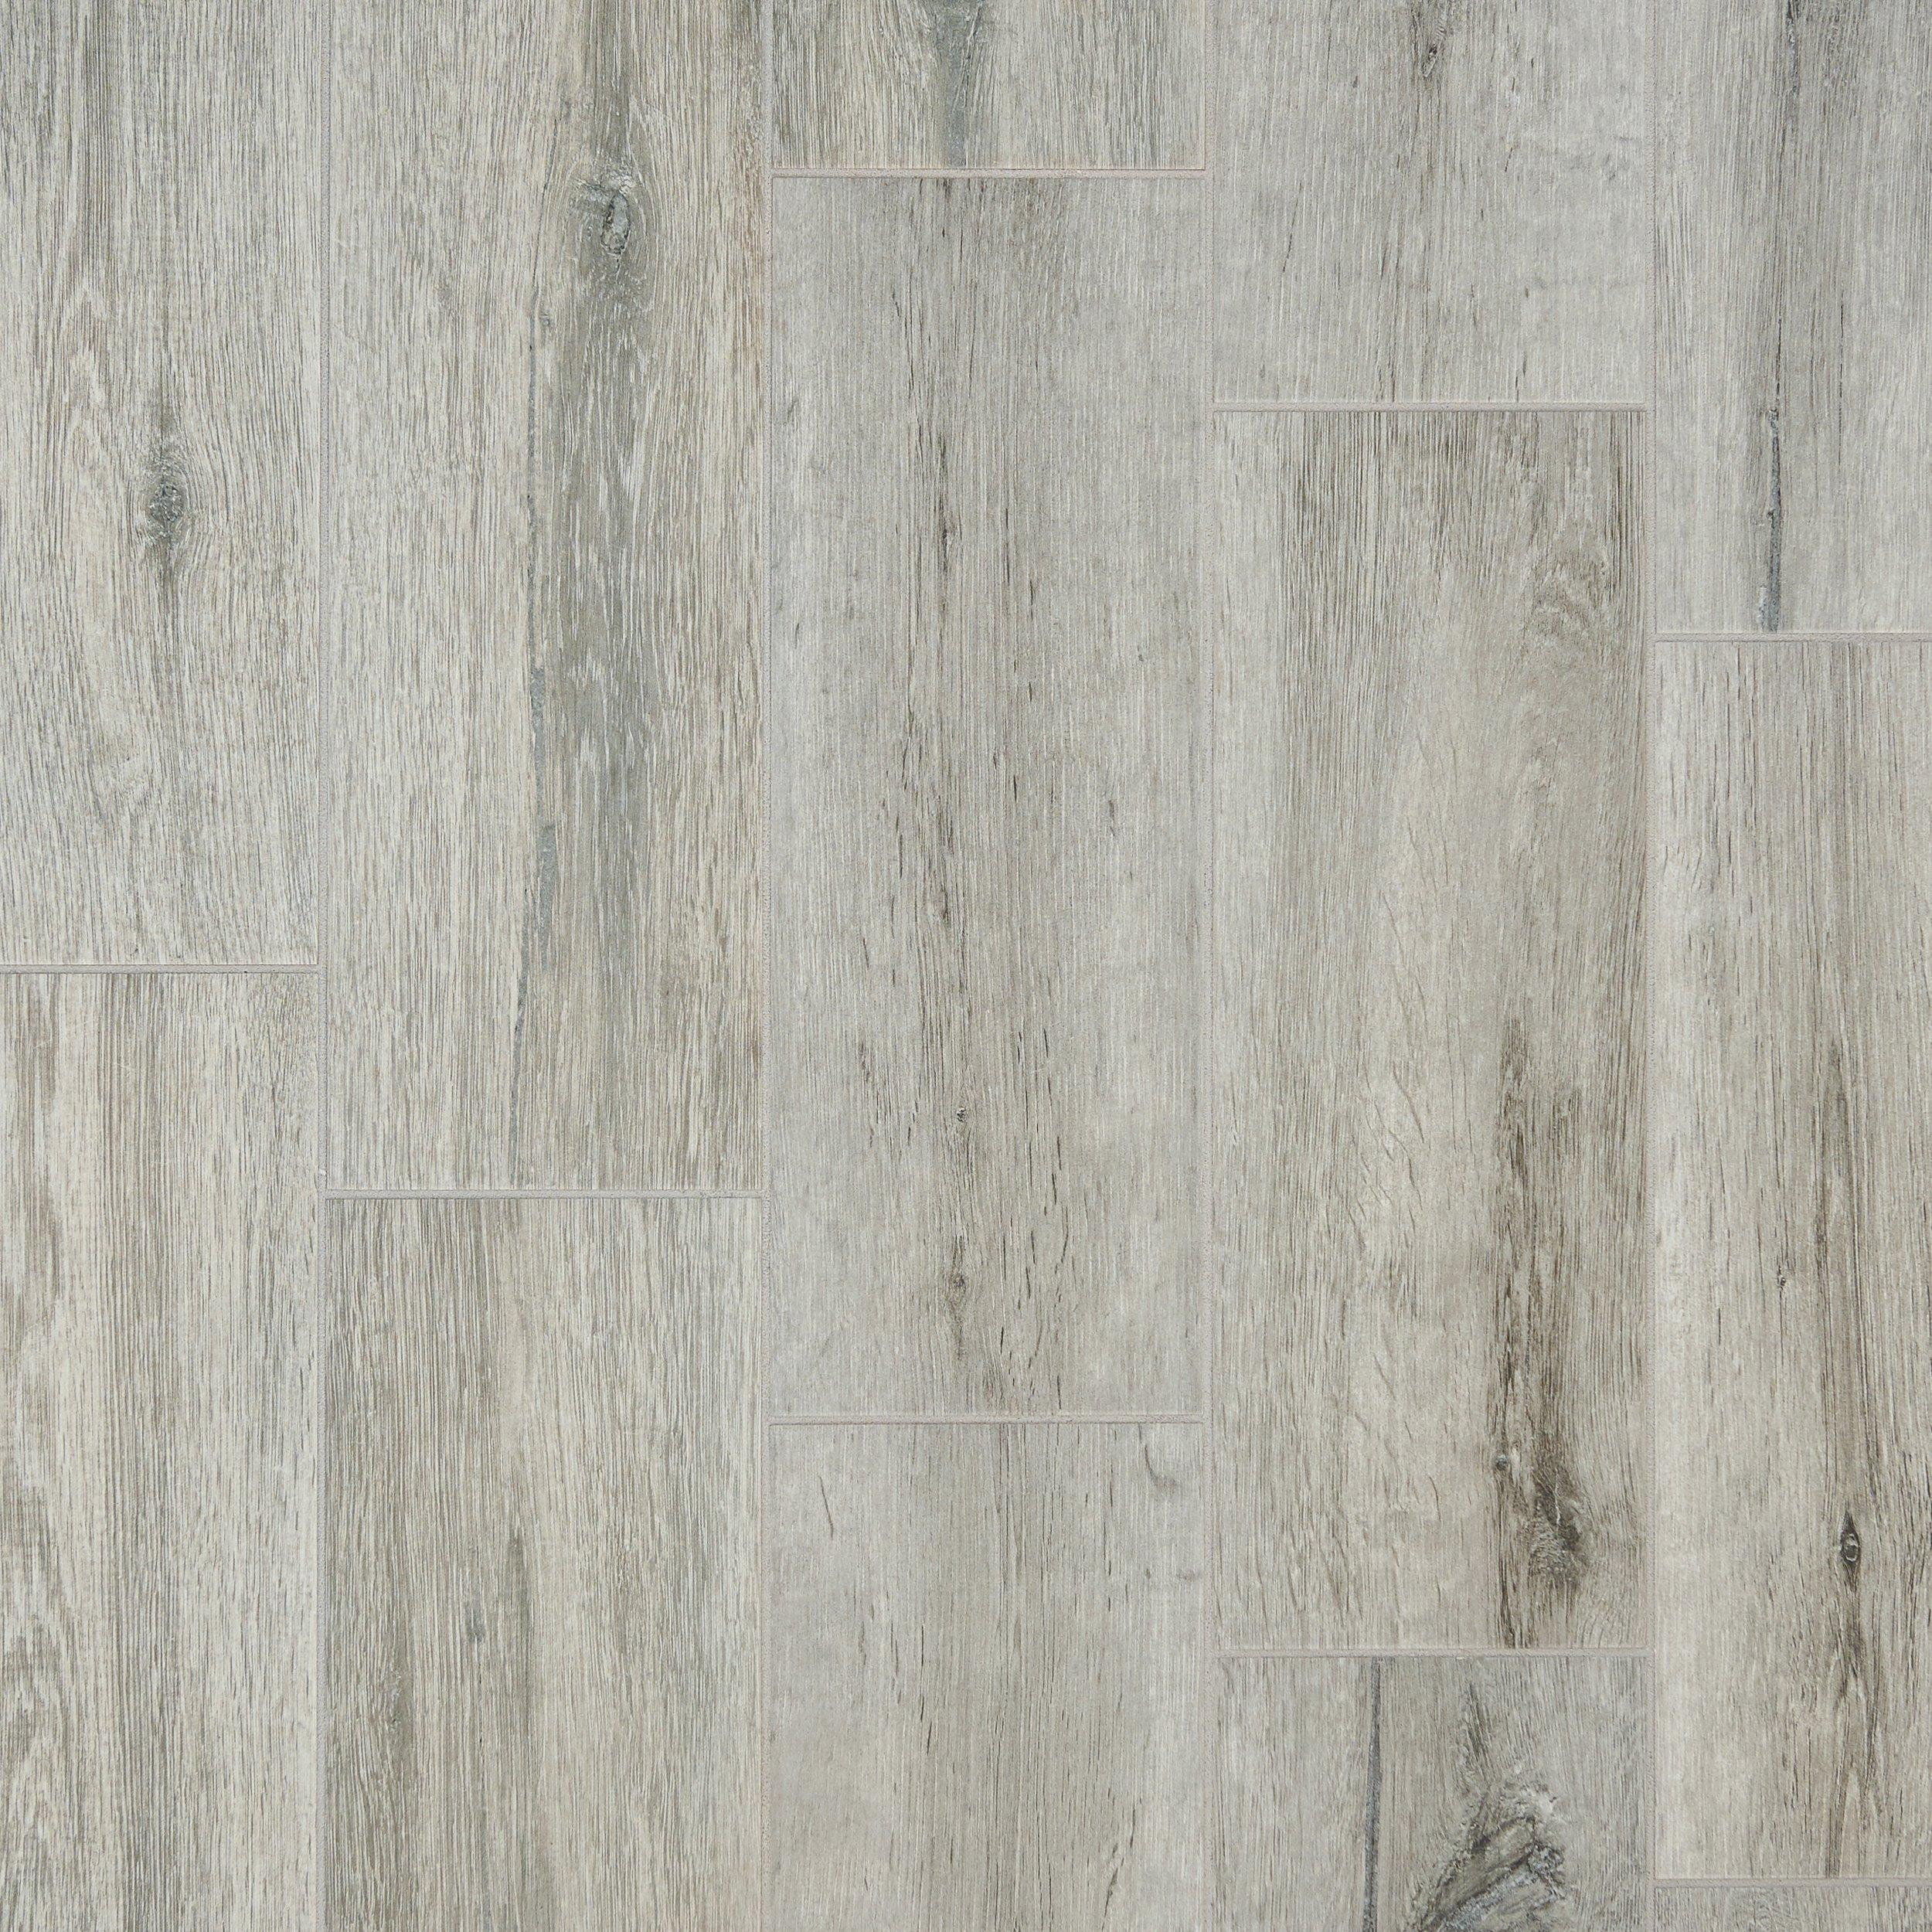 Wood look tile floor decor kivu ceniza wood plank ceramic tile dailygadgetfo Images